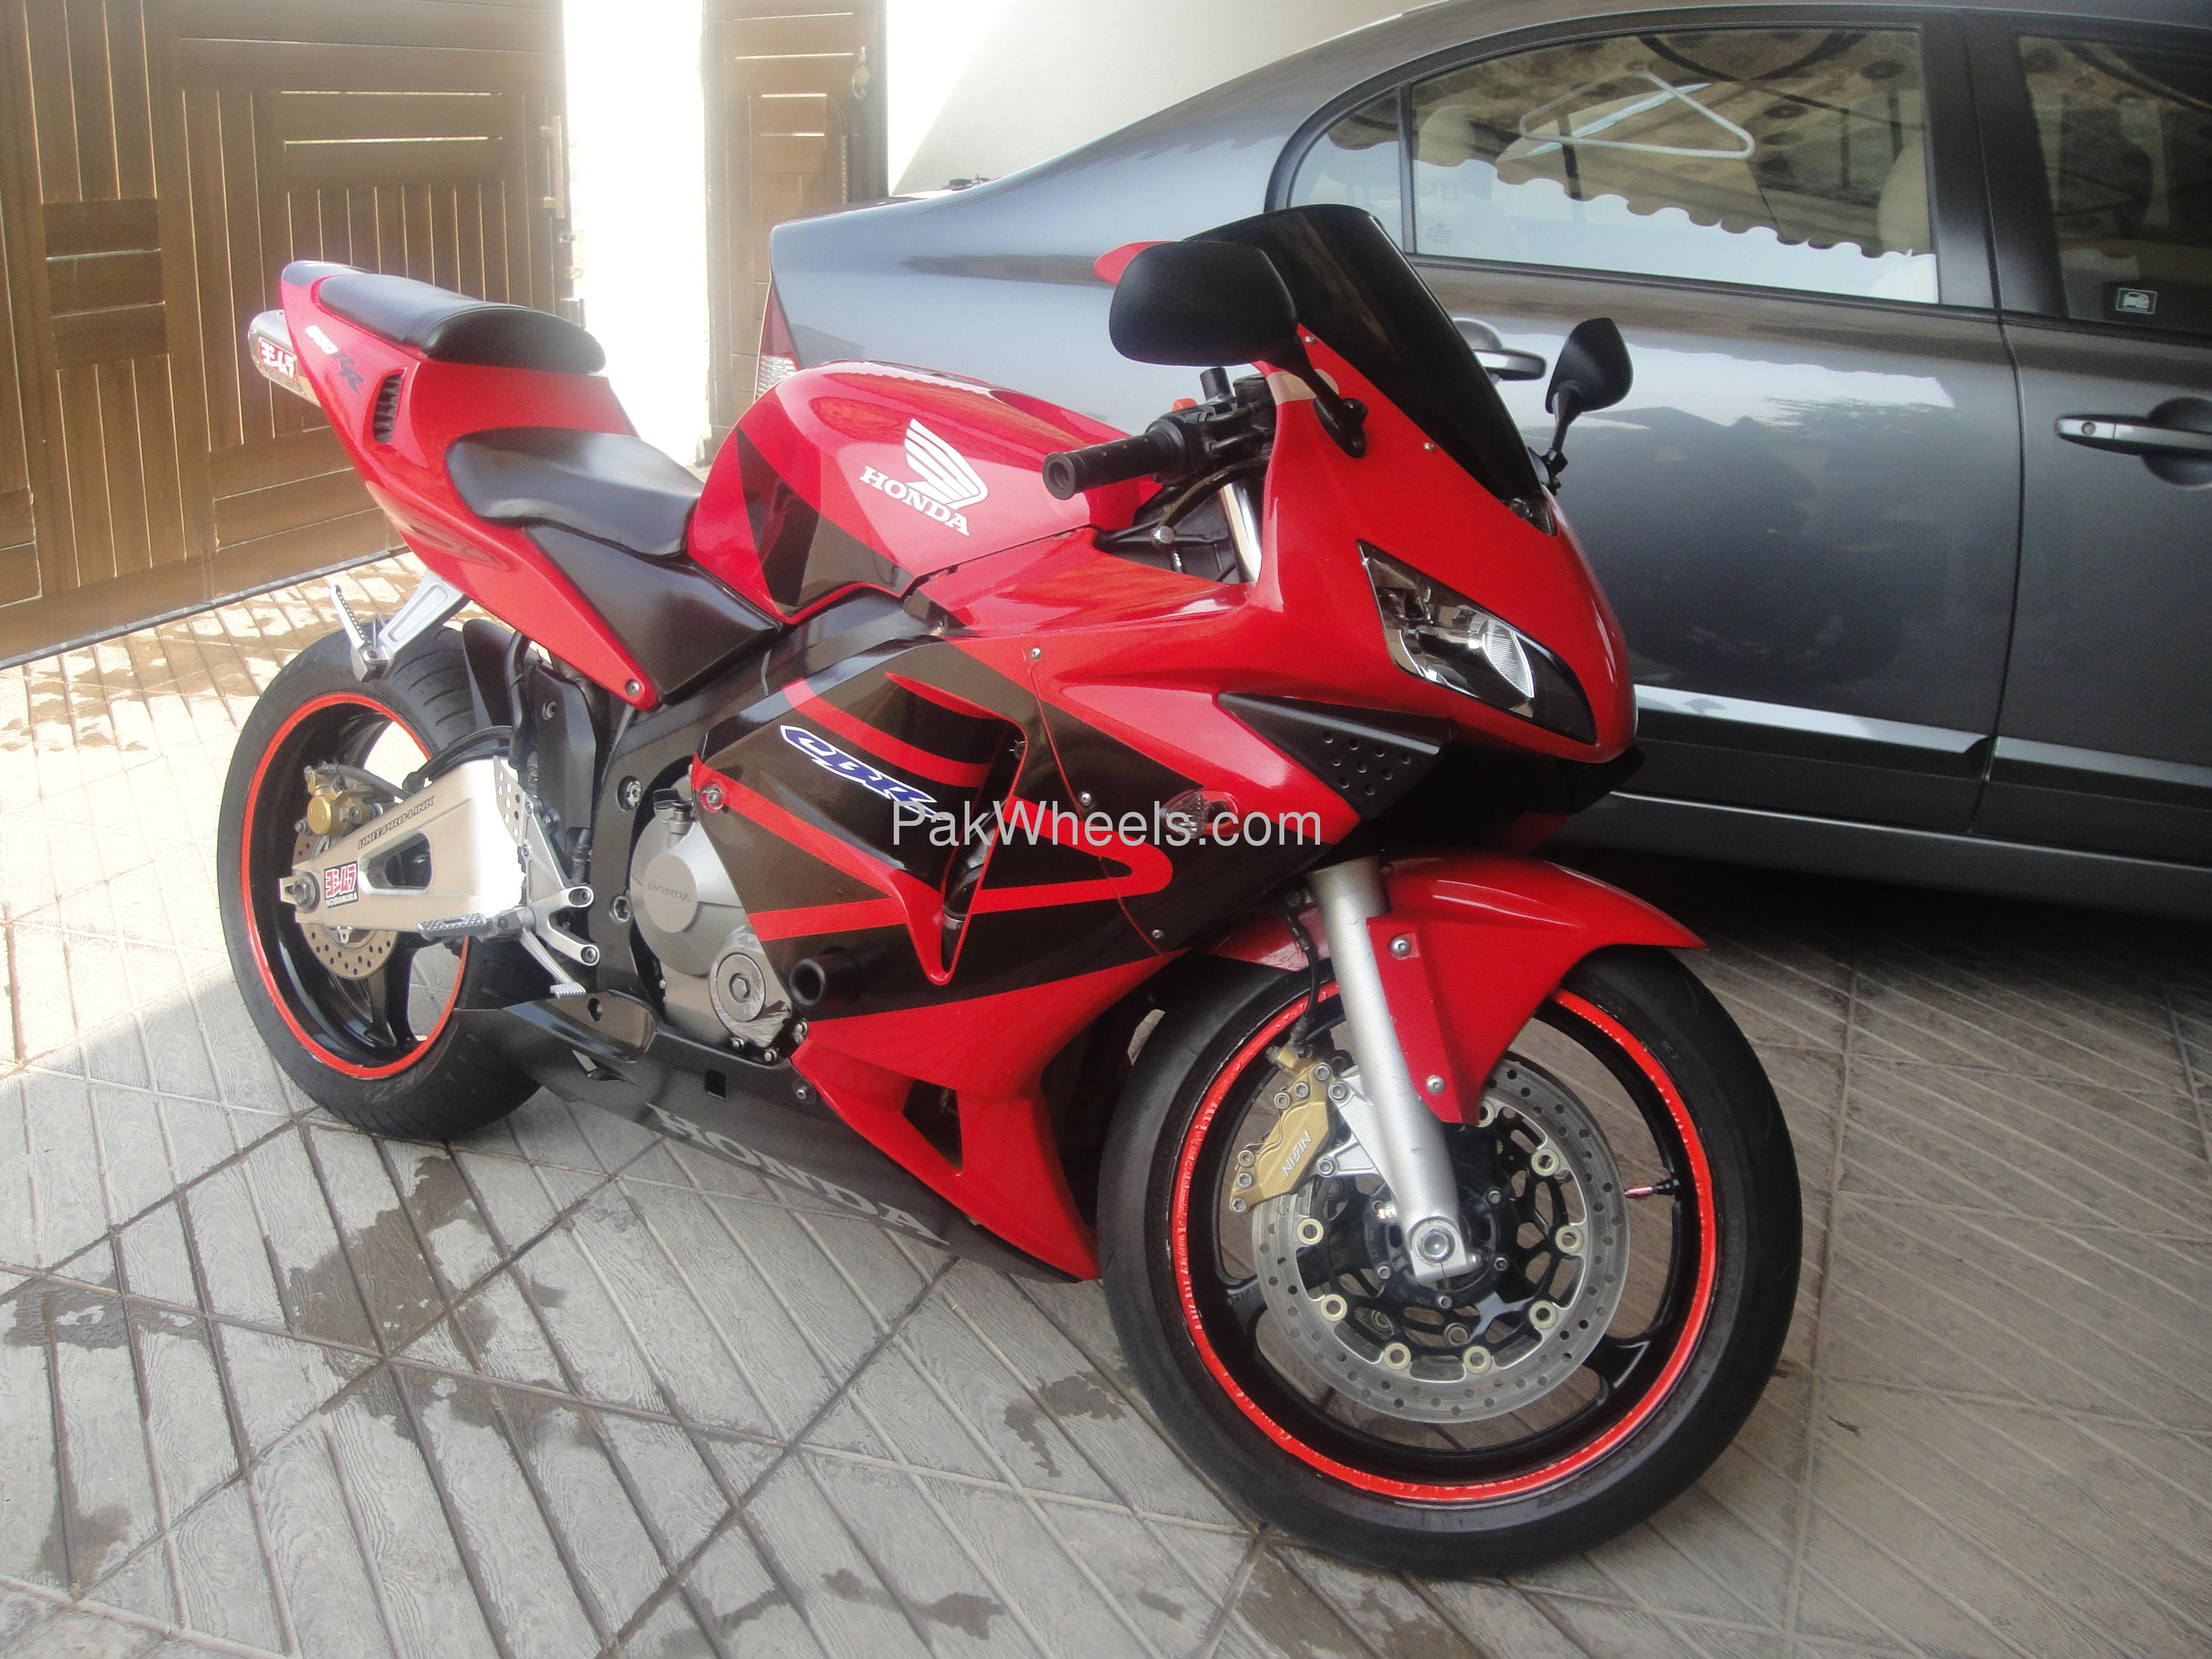 used honda cbr 600rr 2004 bike for sale in islamabad 94250 pakwheels. Black Bedroom Furniture Sets. Home Design Ideas